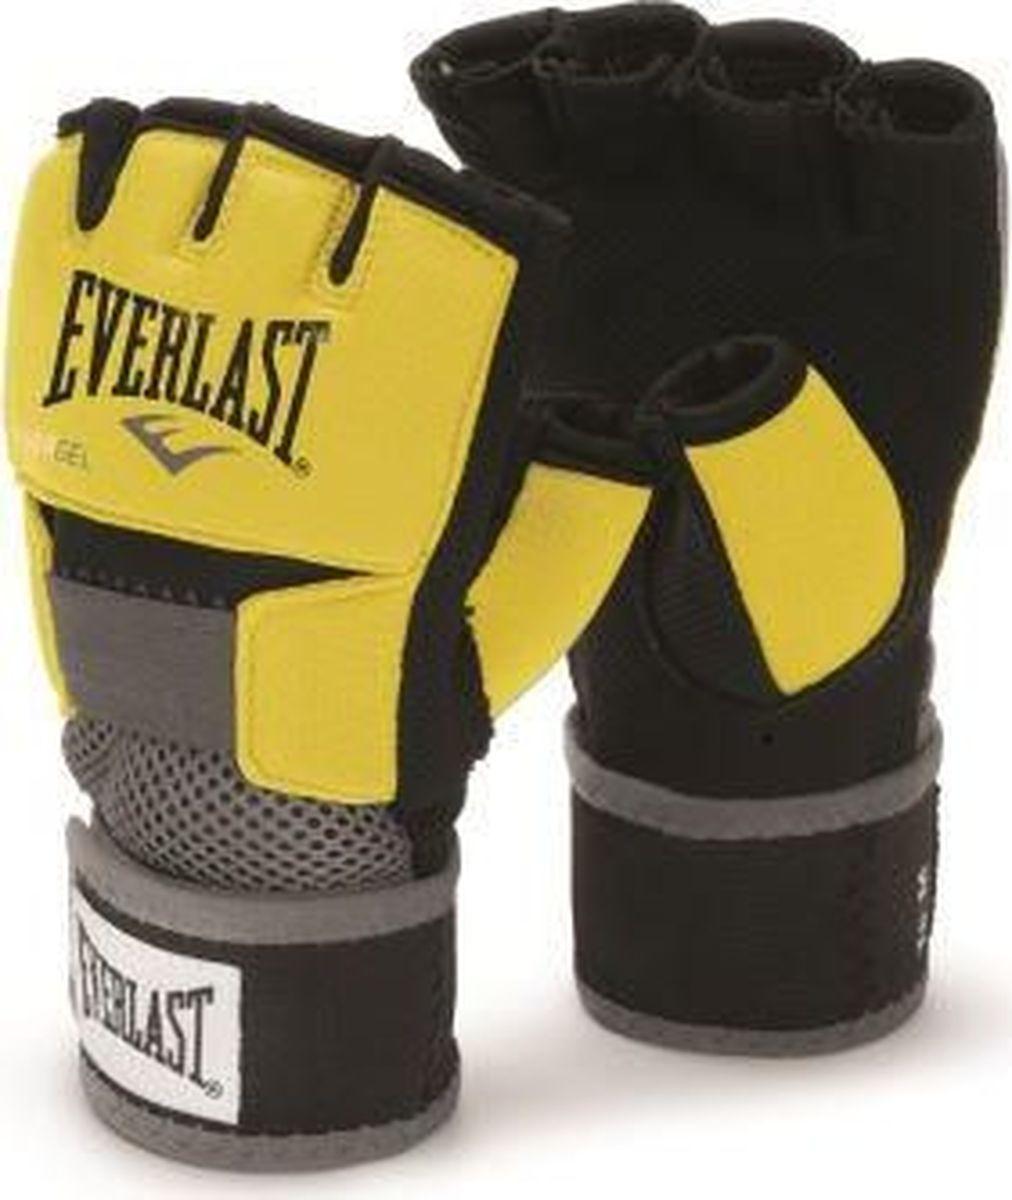 Боксерские перчатки Everlast Evergel, гелевые, 4355LU, желтый, черный, размер L